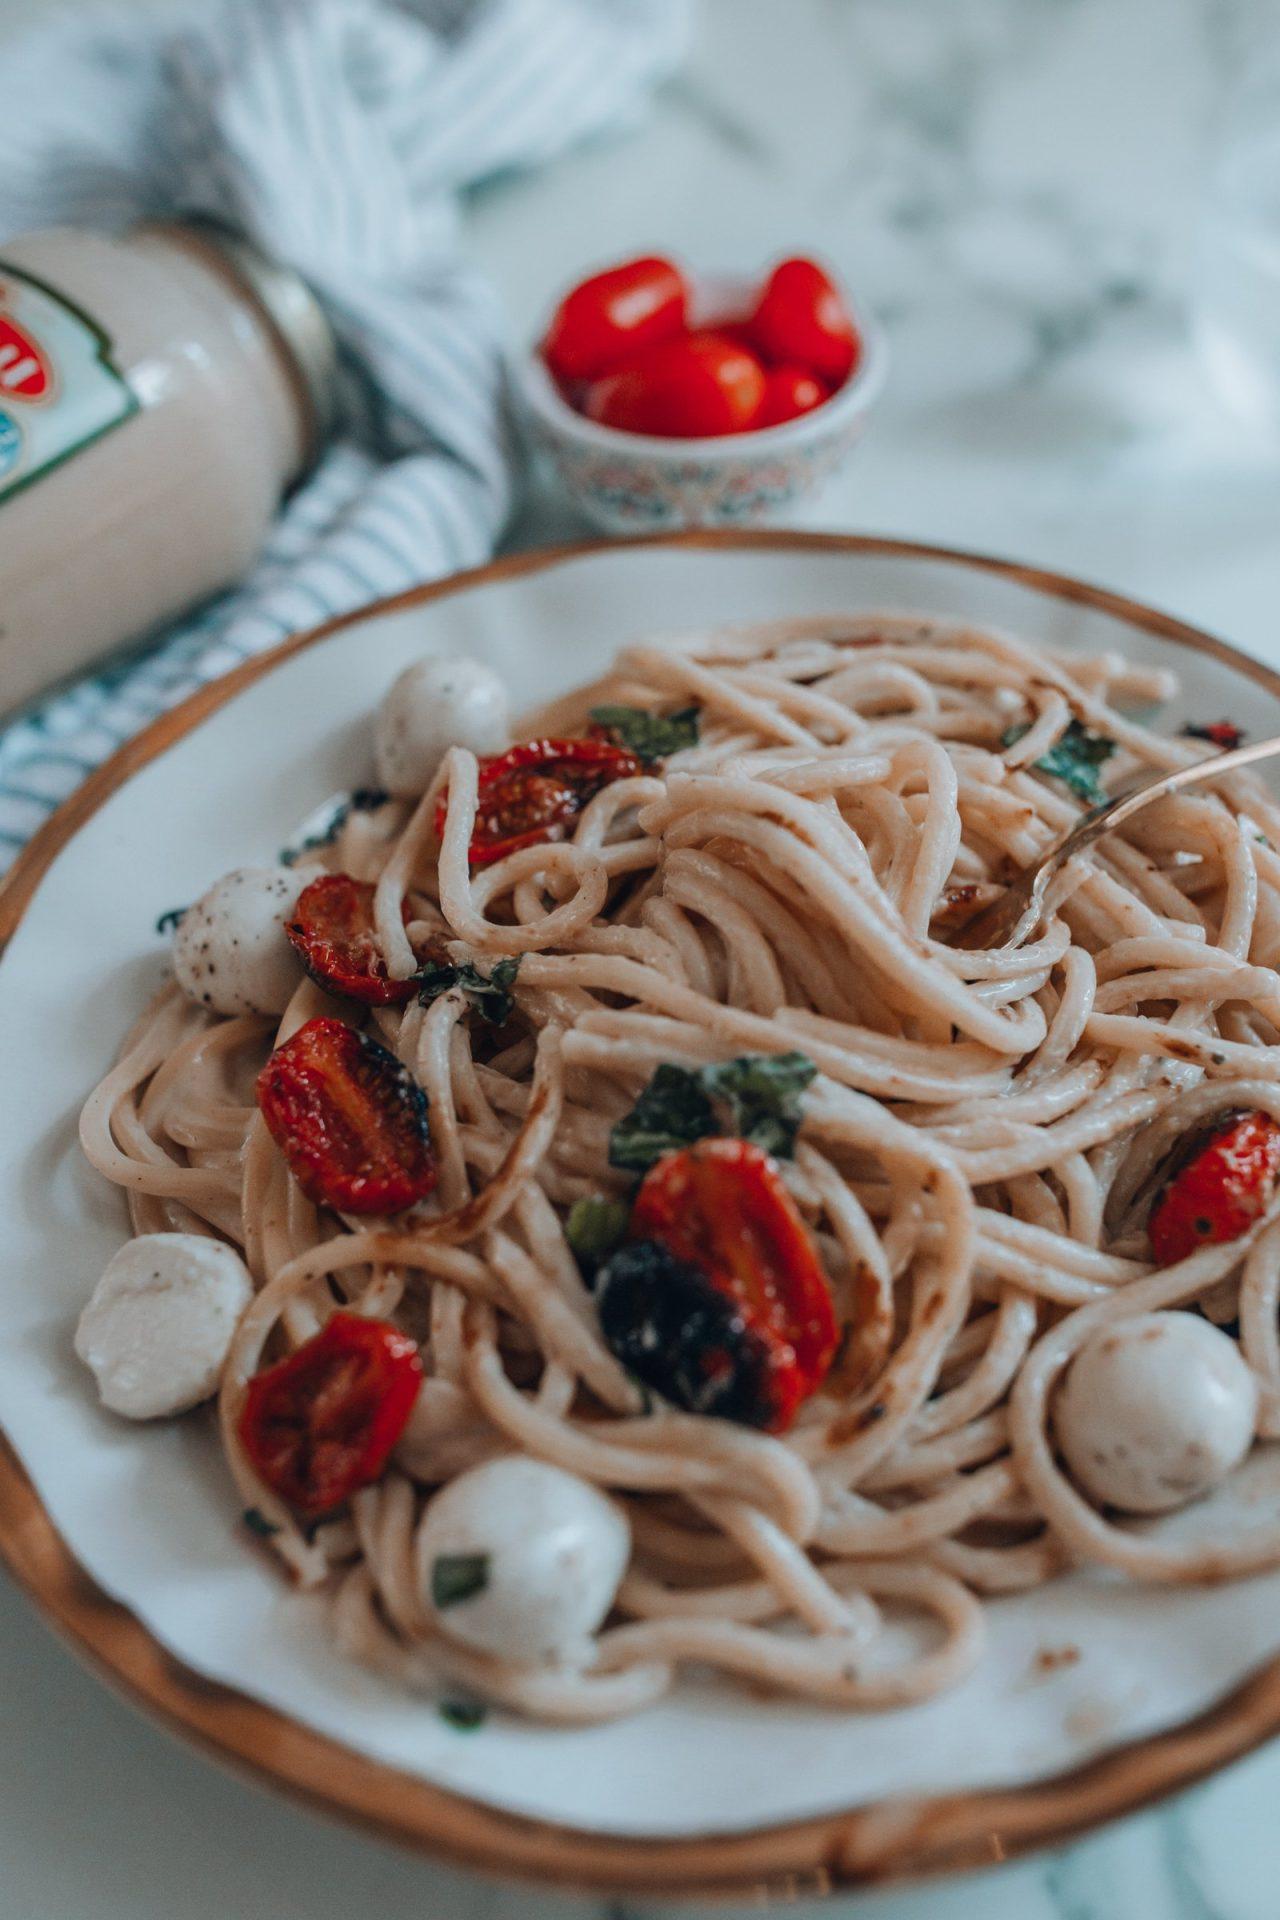 healthy alfredo sauce brand, easy family dinners